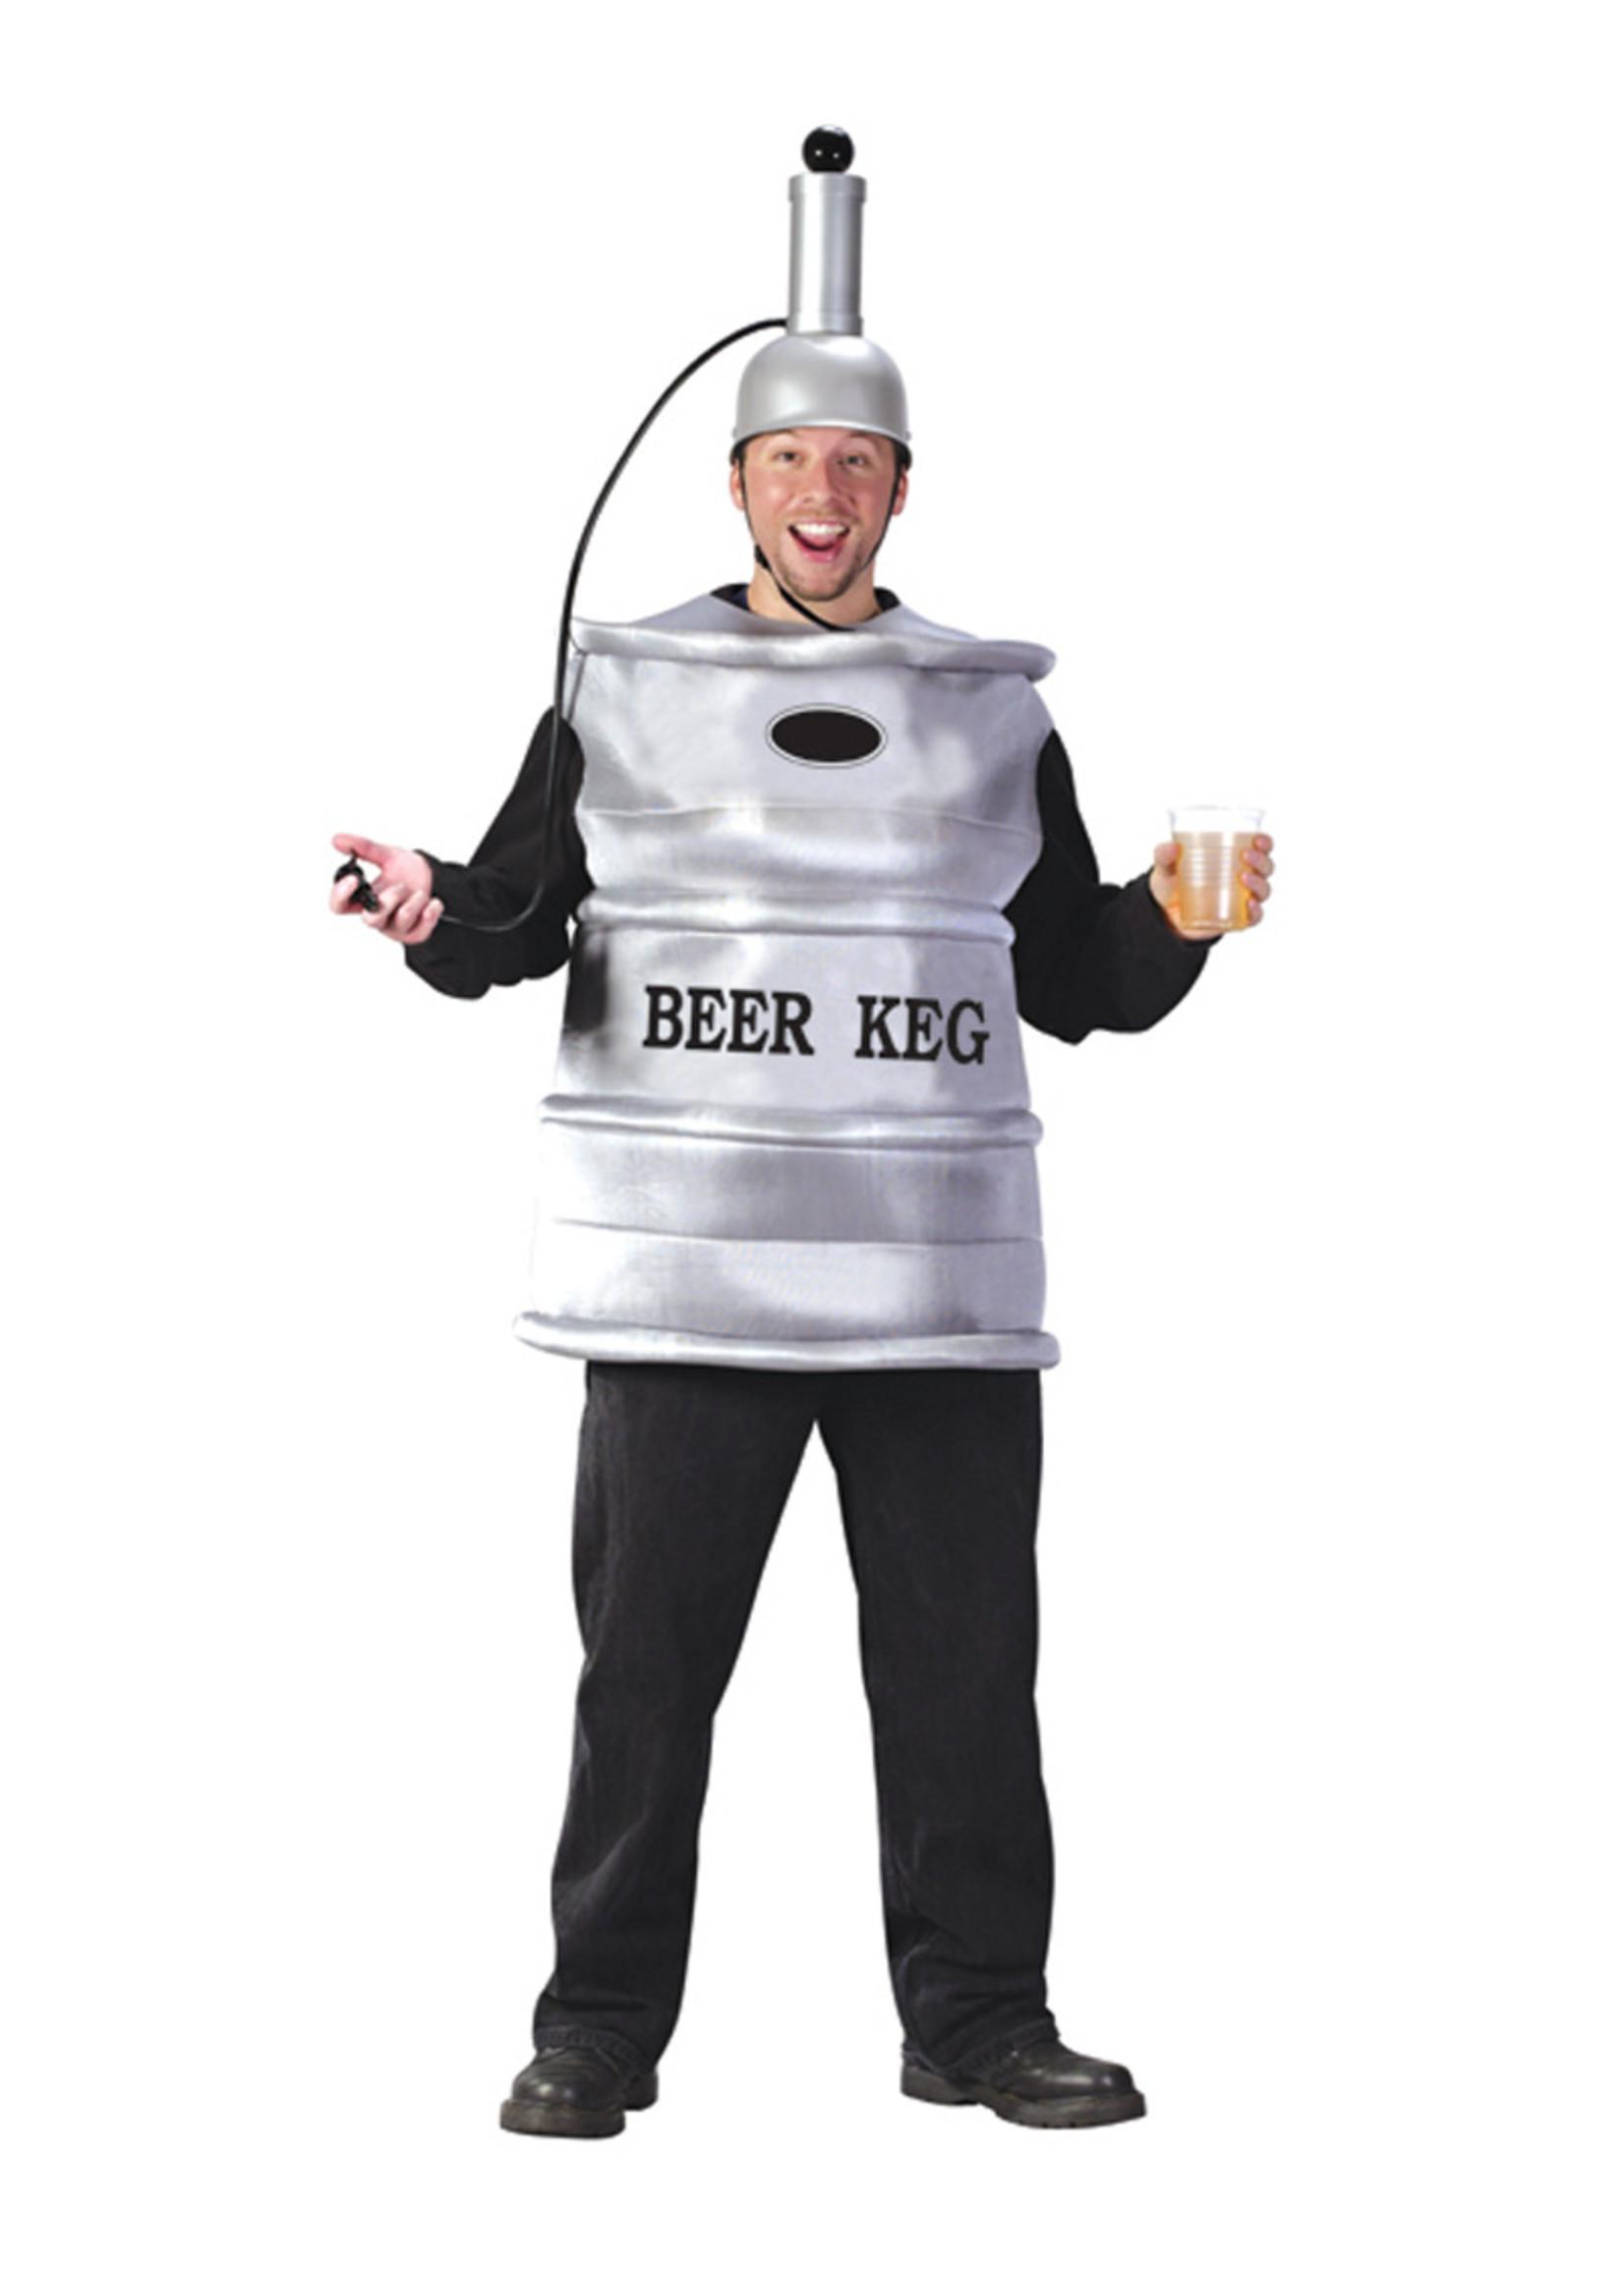 FUN WORLD Beer Keg Costume - Humor